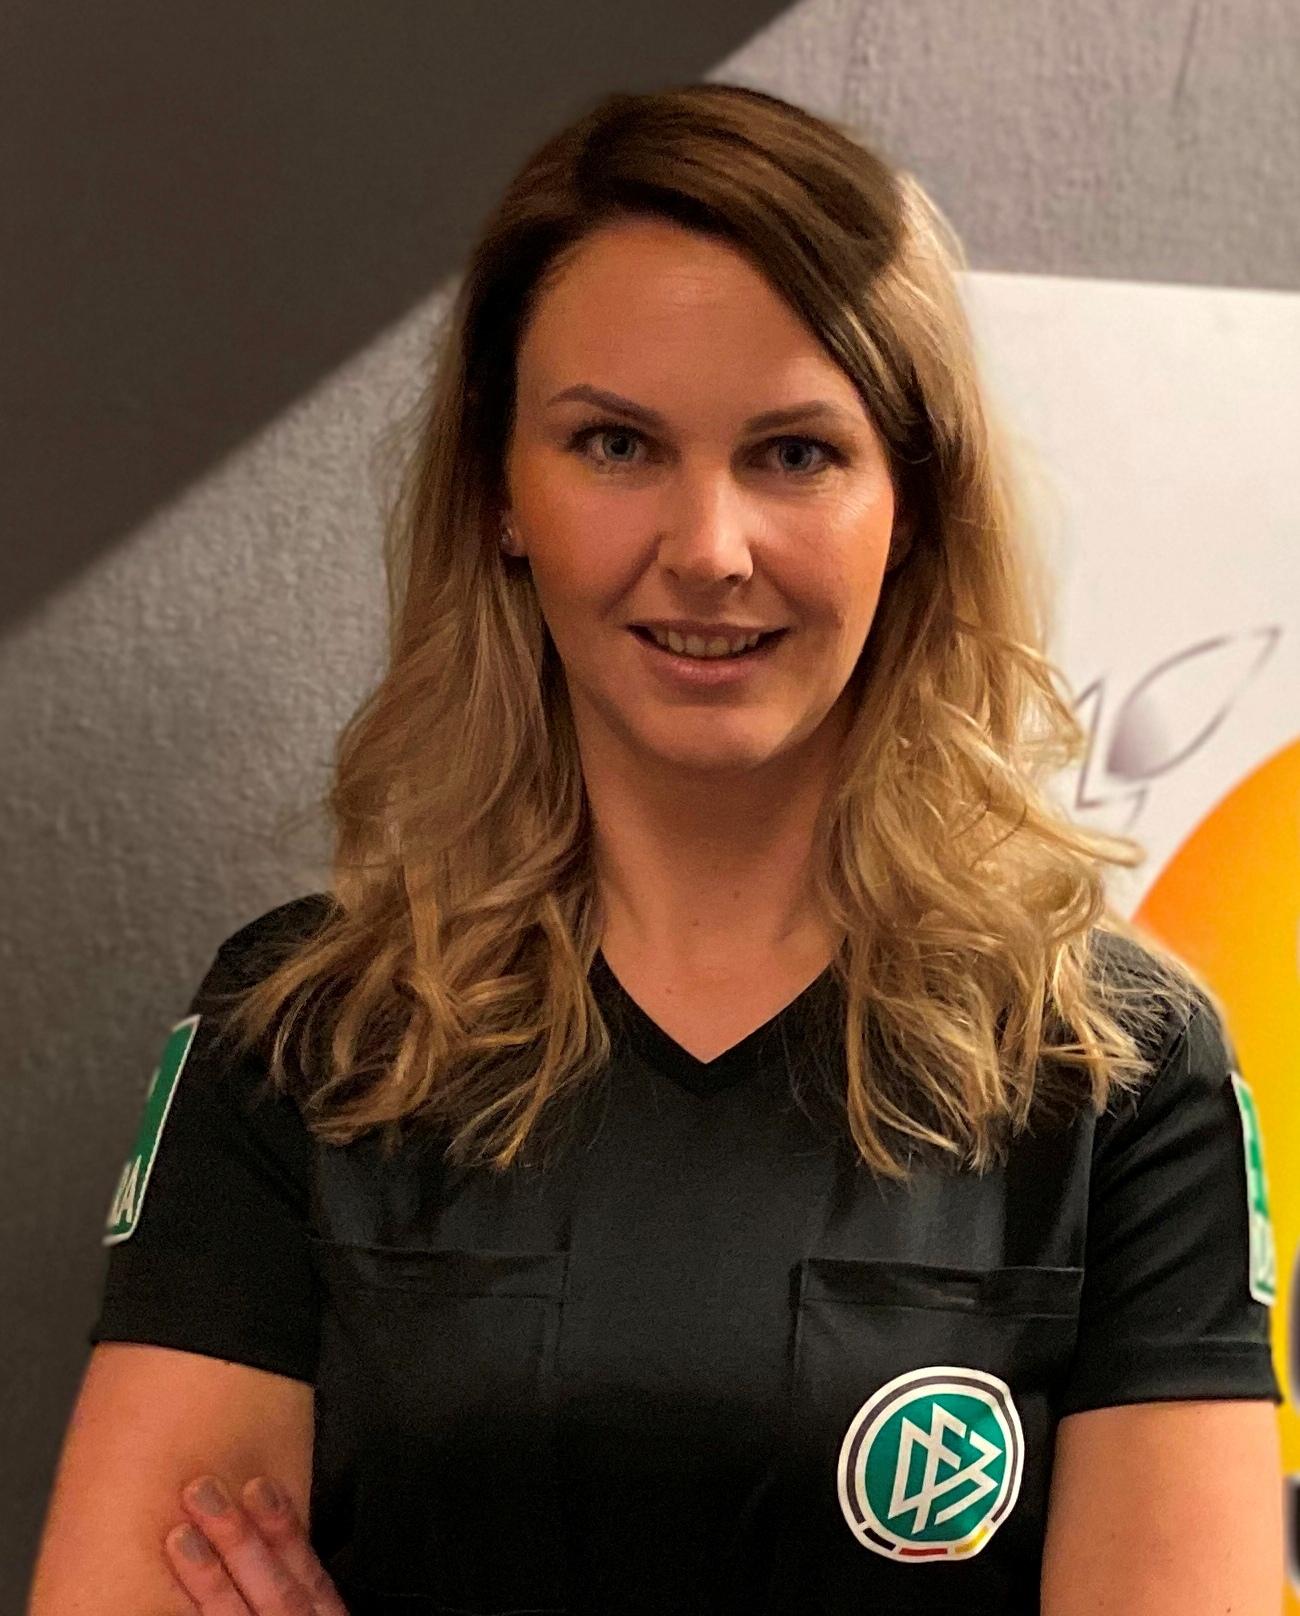 Christina Biehl